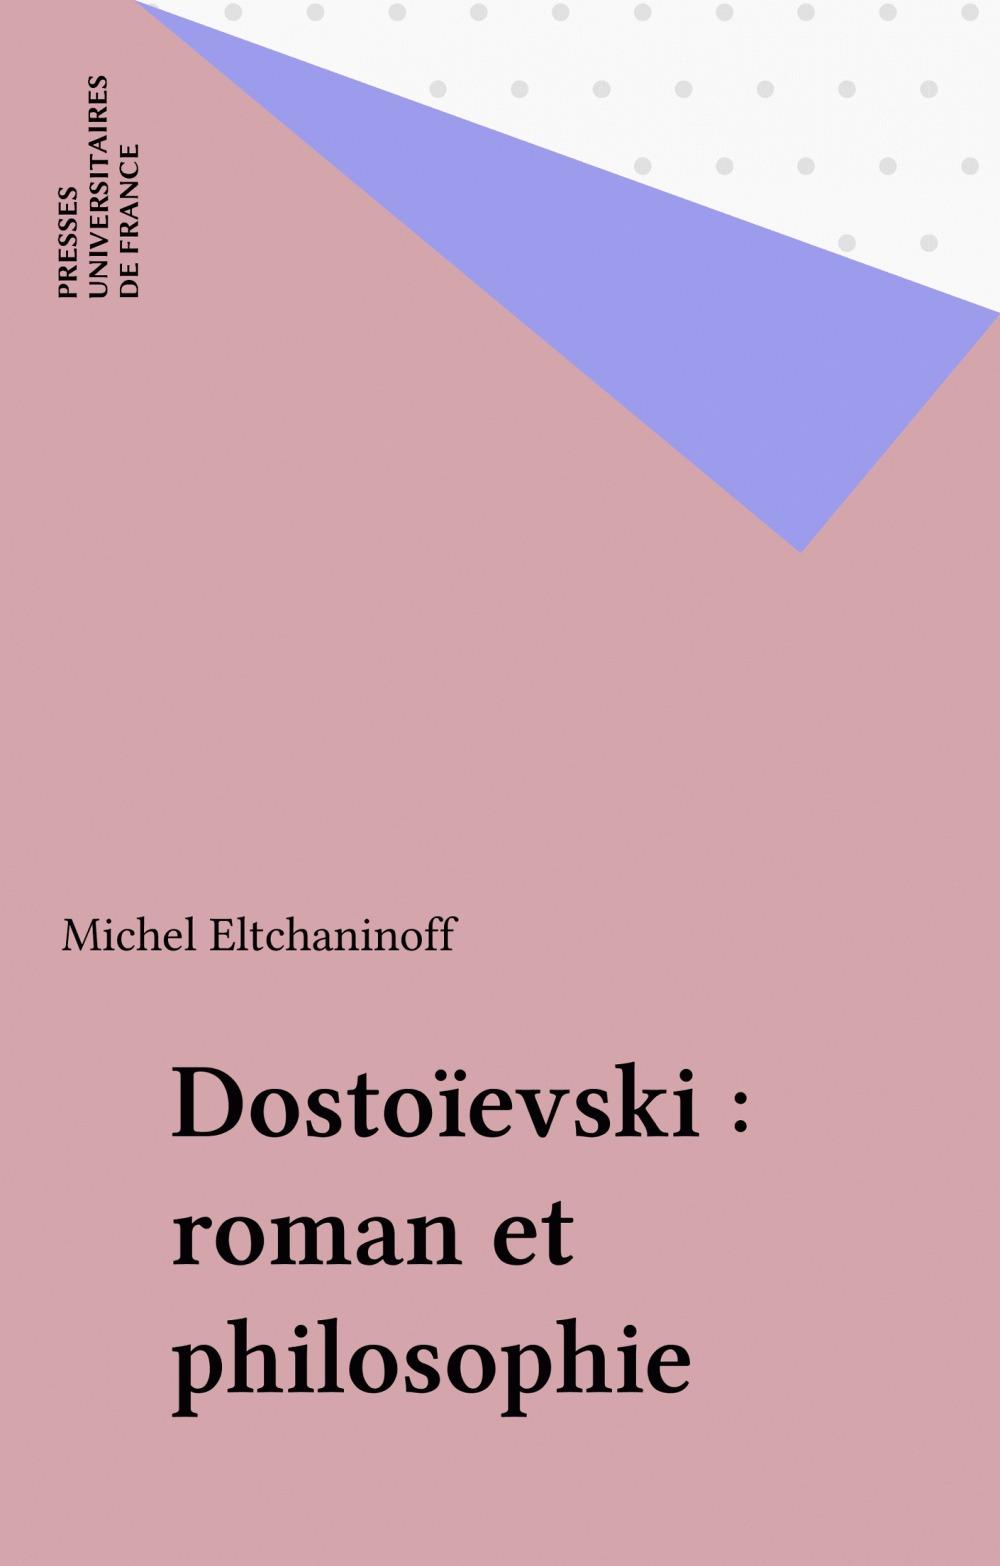 Dostoievski. roman et philosophie